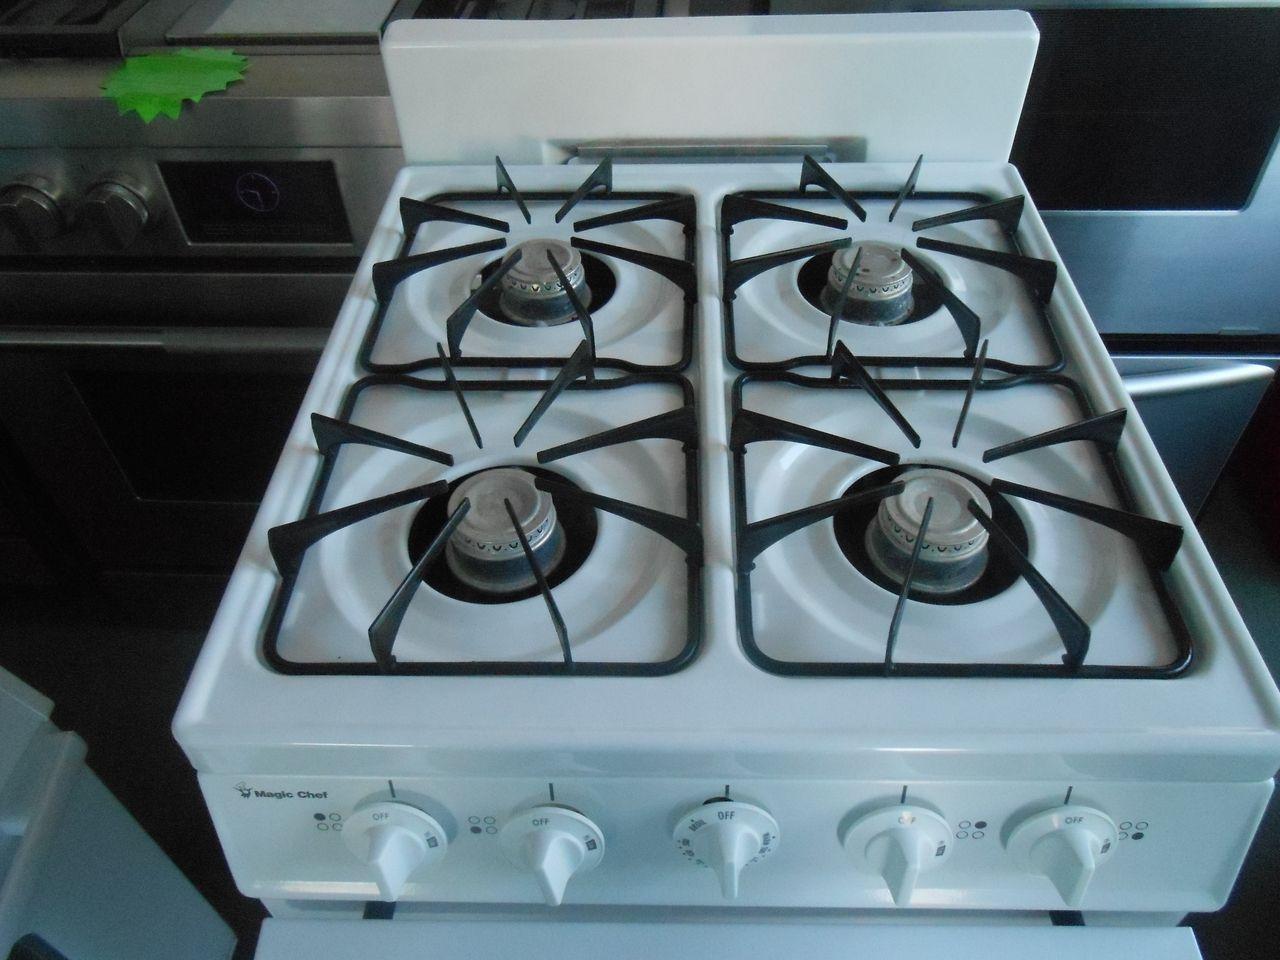 Appliance City - MAGIC CHEF 20 INCH FREE STANDING GAS RANGE 4 BURNER ...